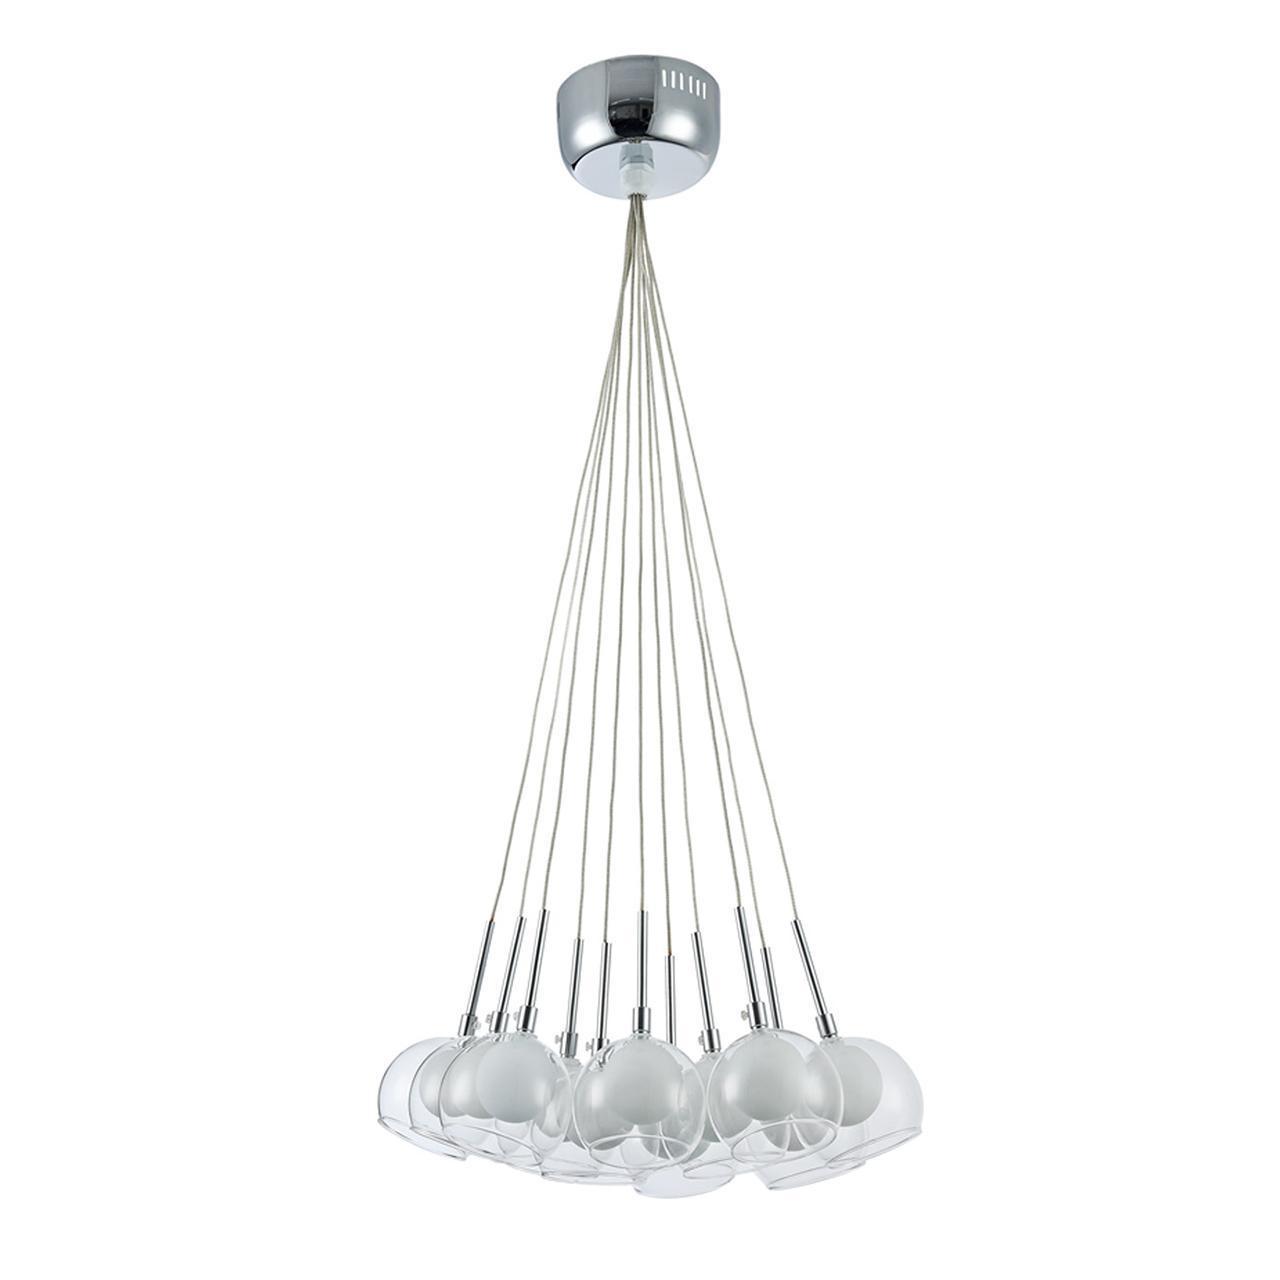 Подвесной светильник Freya FR5175-PL-11-CH, белый люстра freya freya fr5175 pl 07 ch